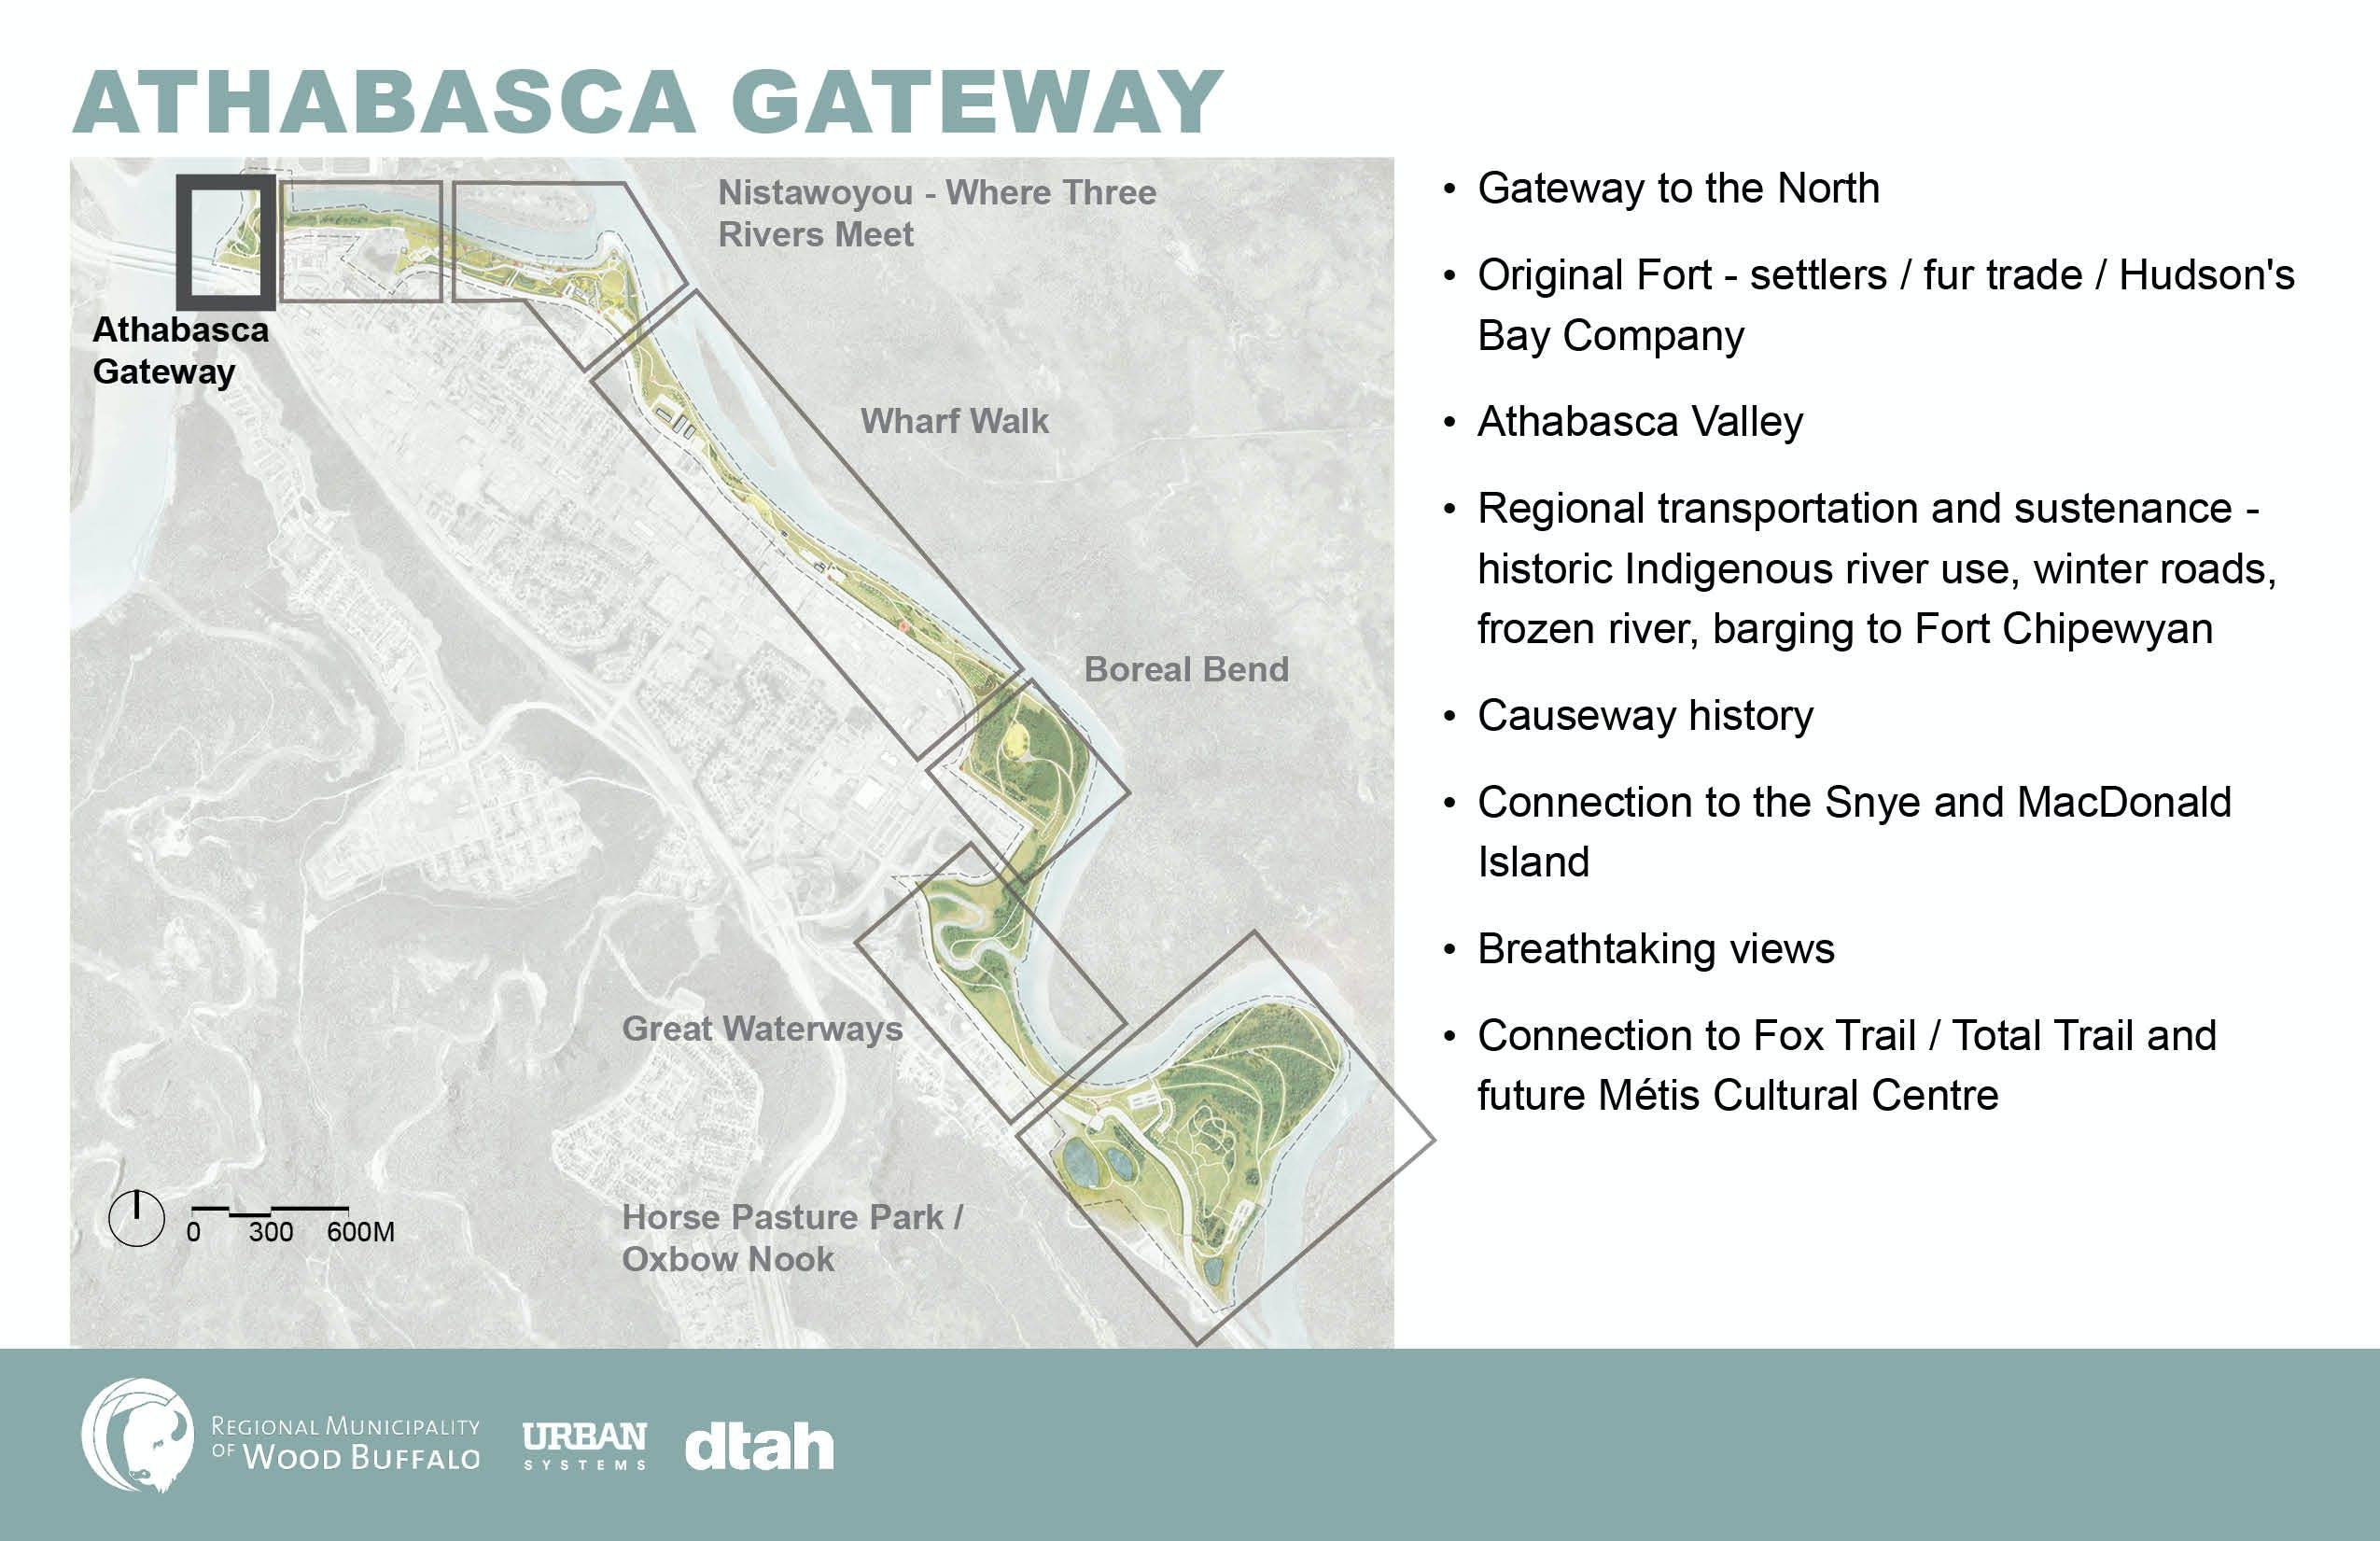 Athabasca Gateway